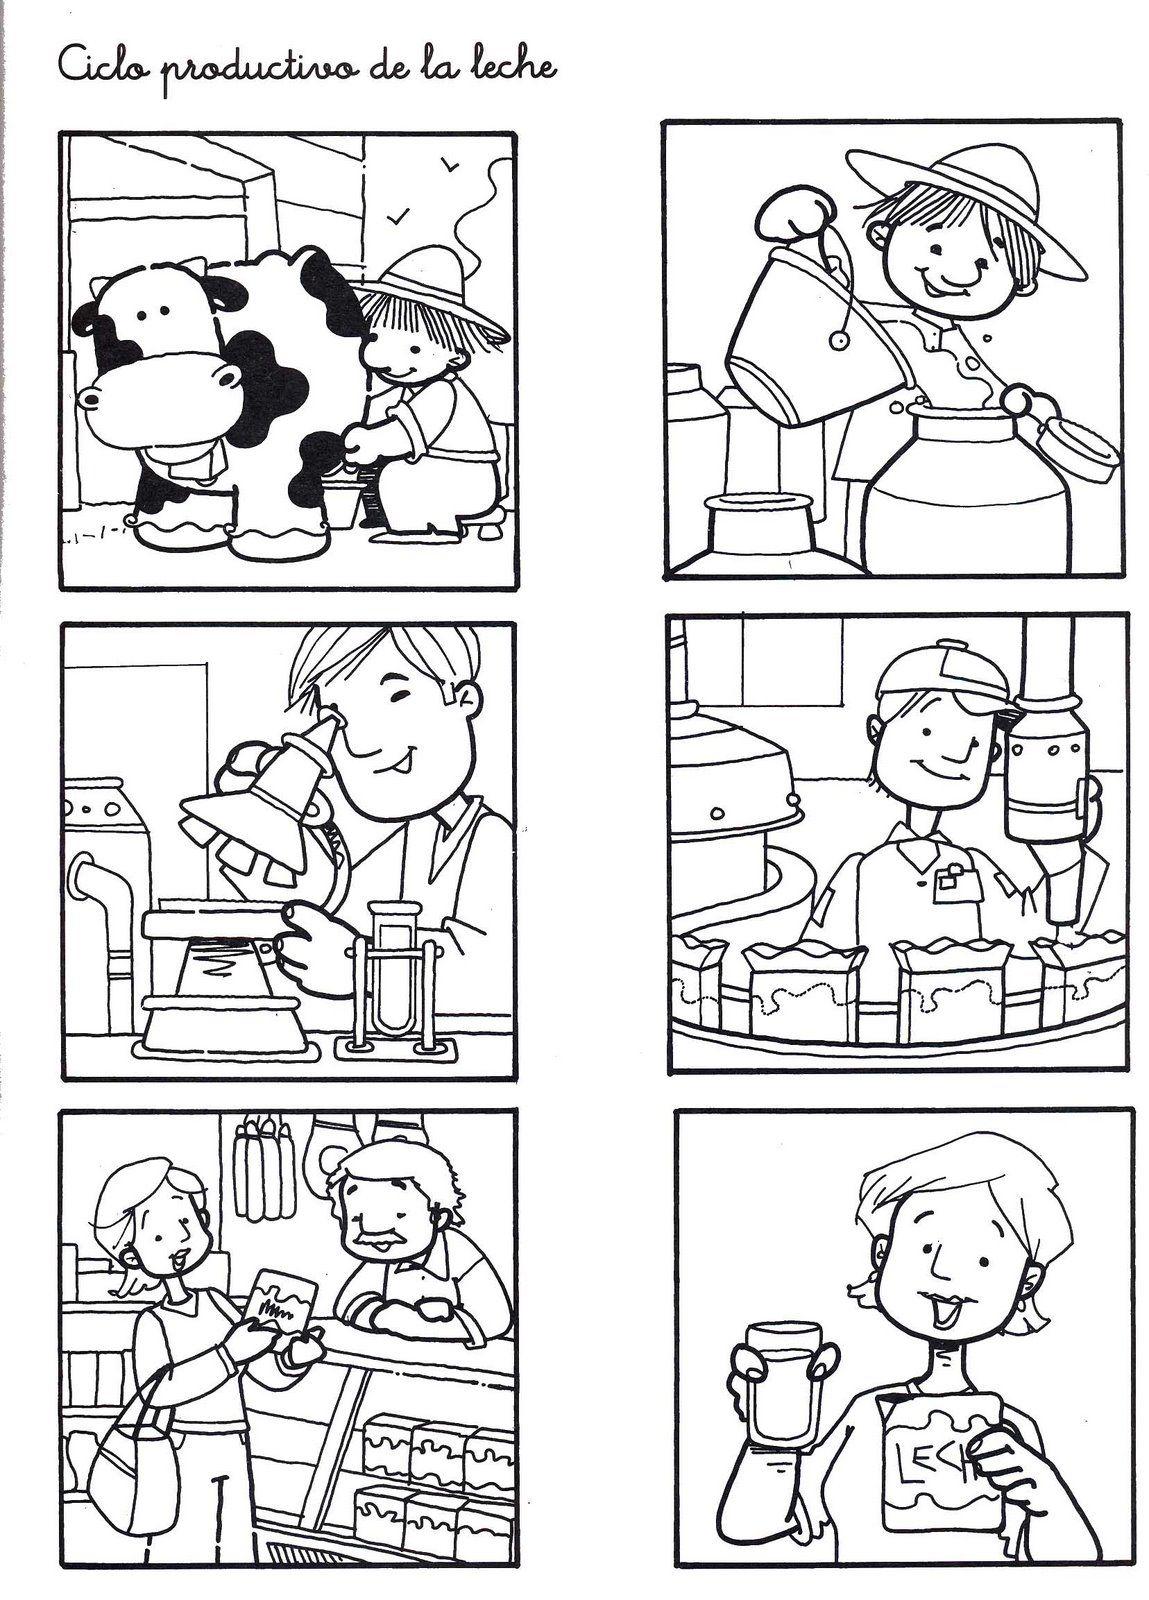 Circuito De La Leche : Fotó ciclo productivo de la leche fogalmazás school